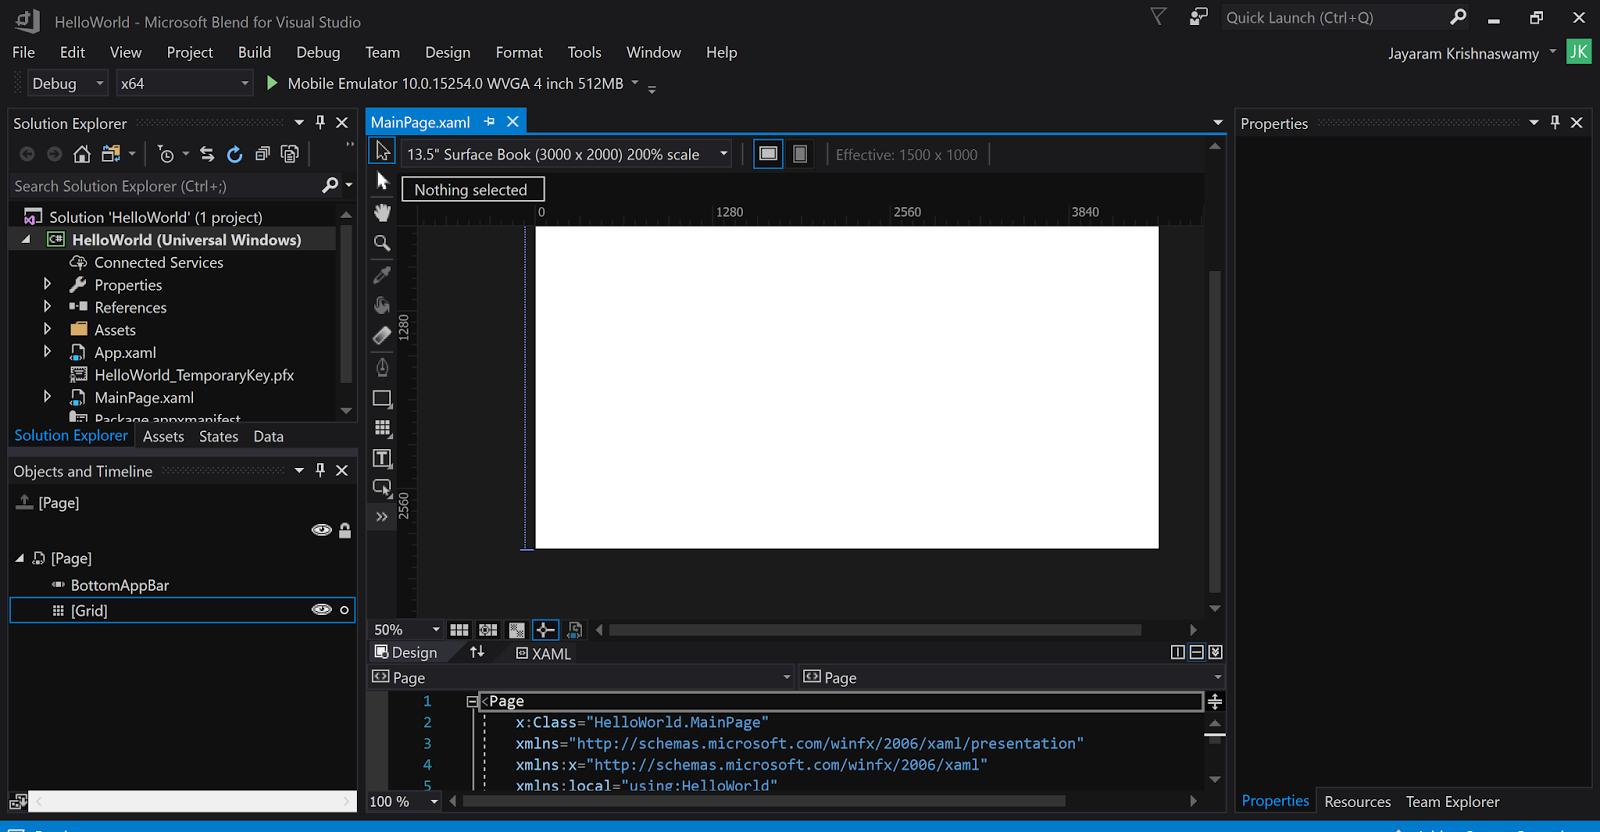 Workaround: UWP project with Visual Studio 2017 Community